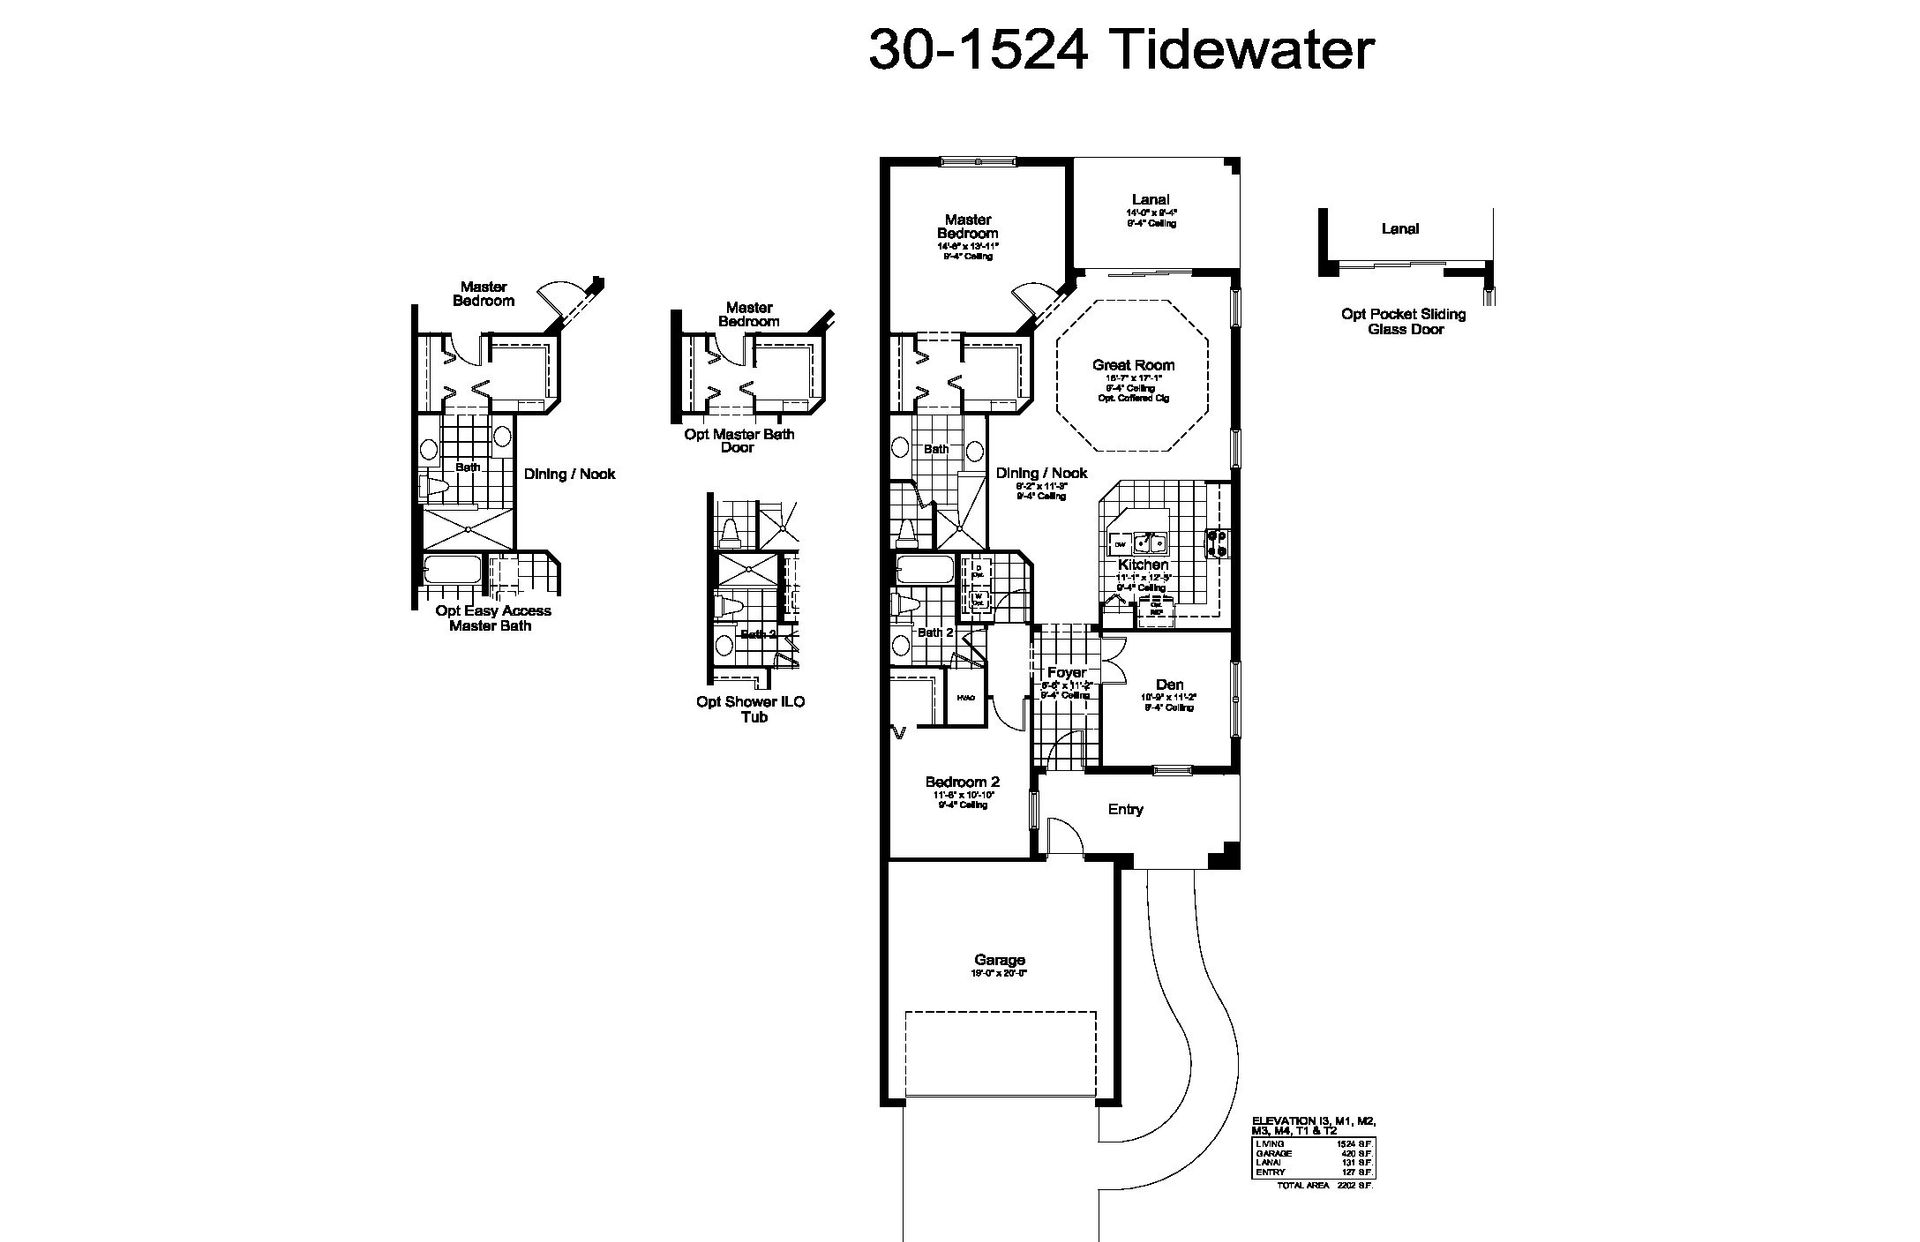 Tidewater Plan